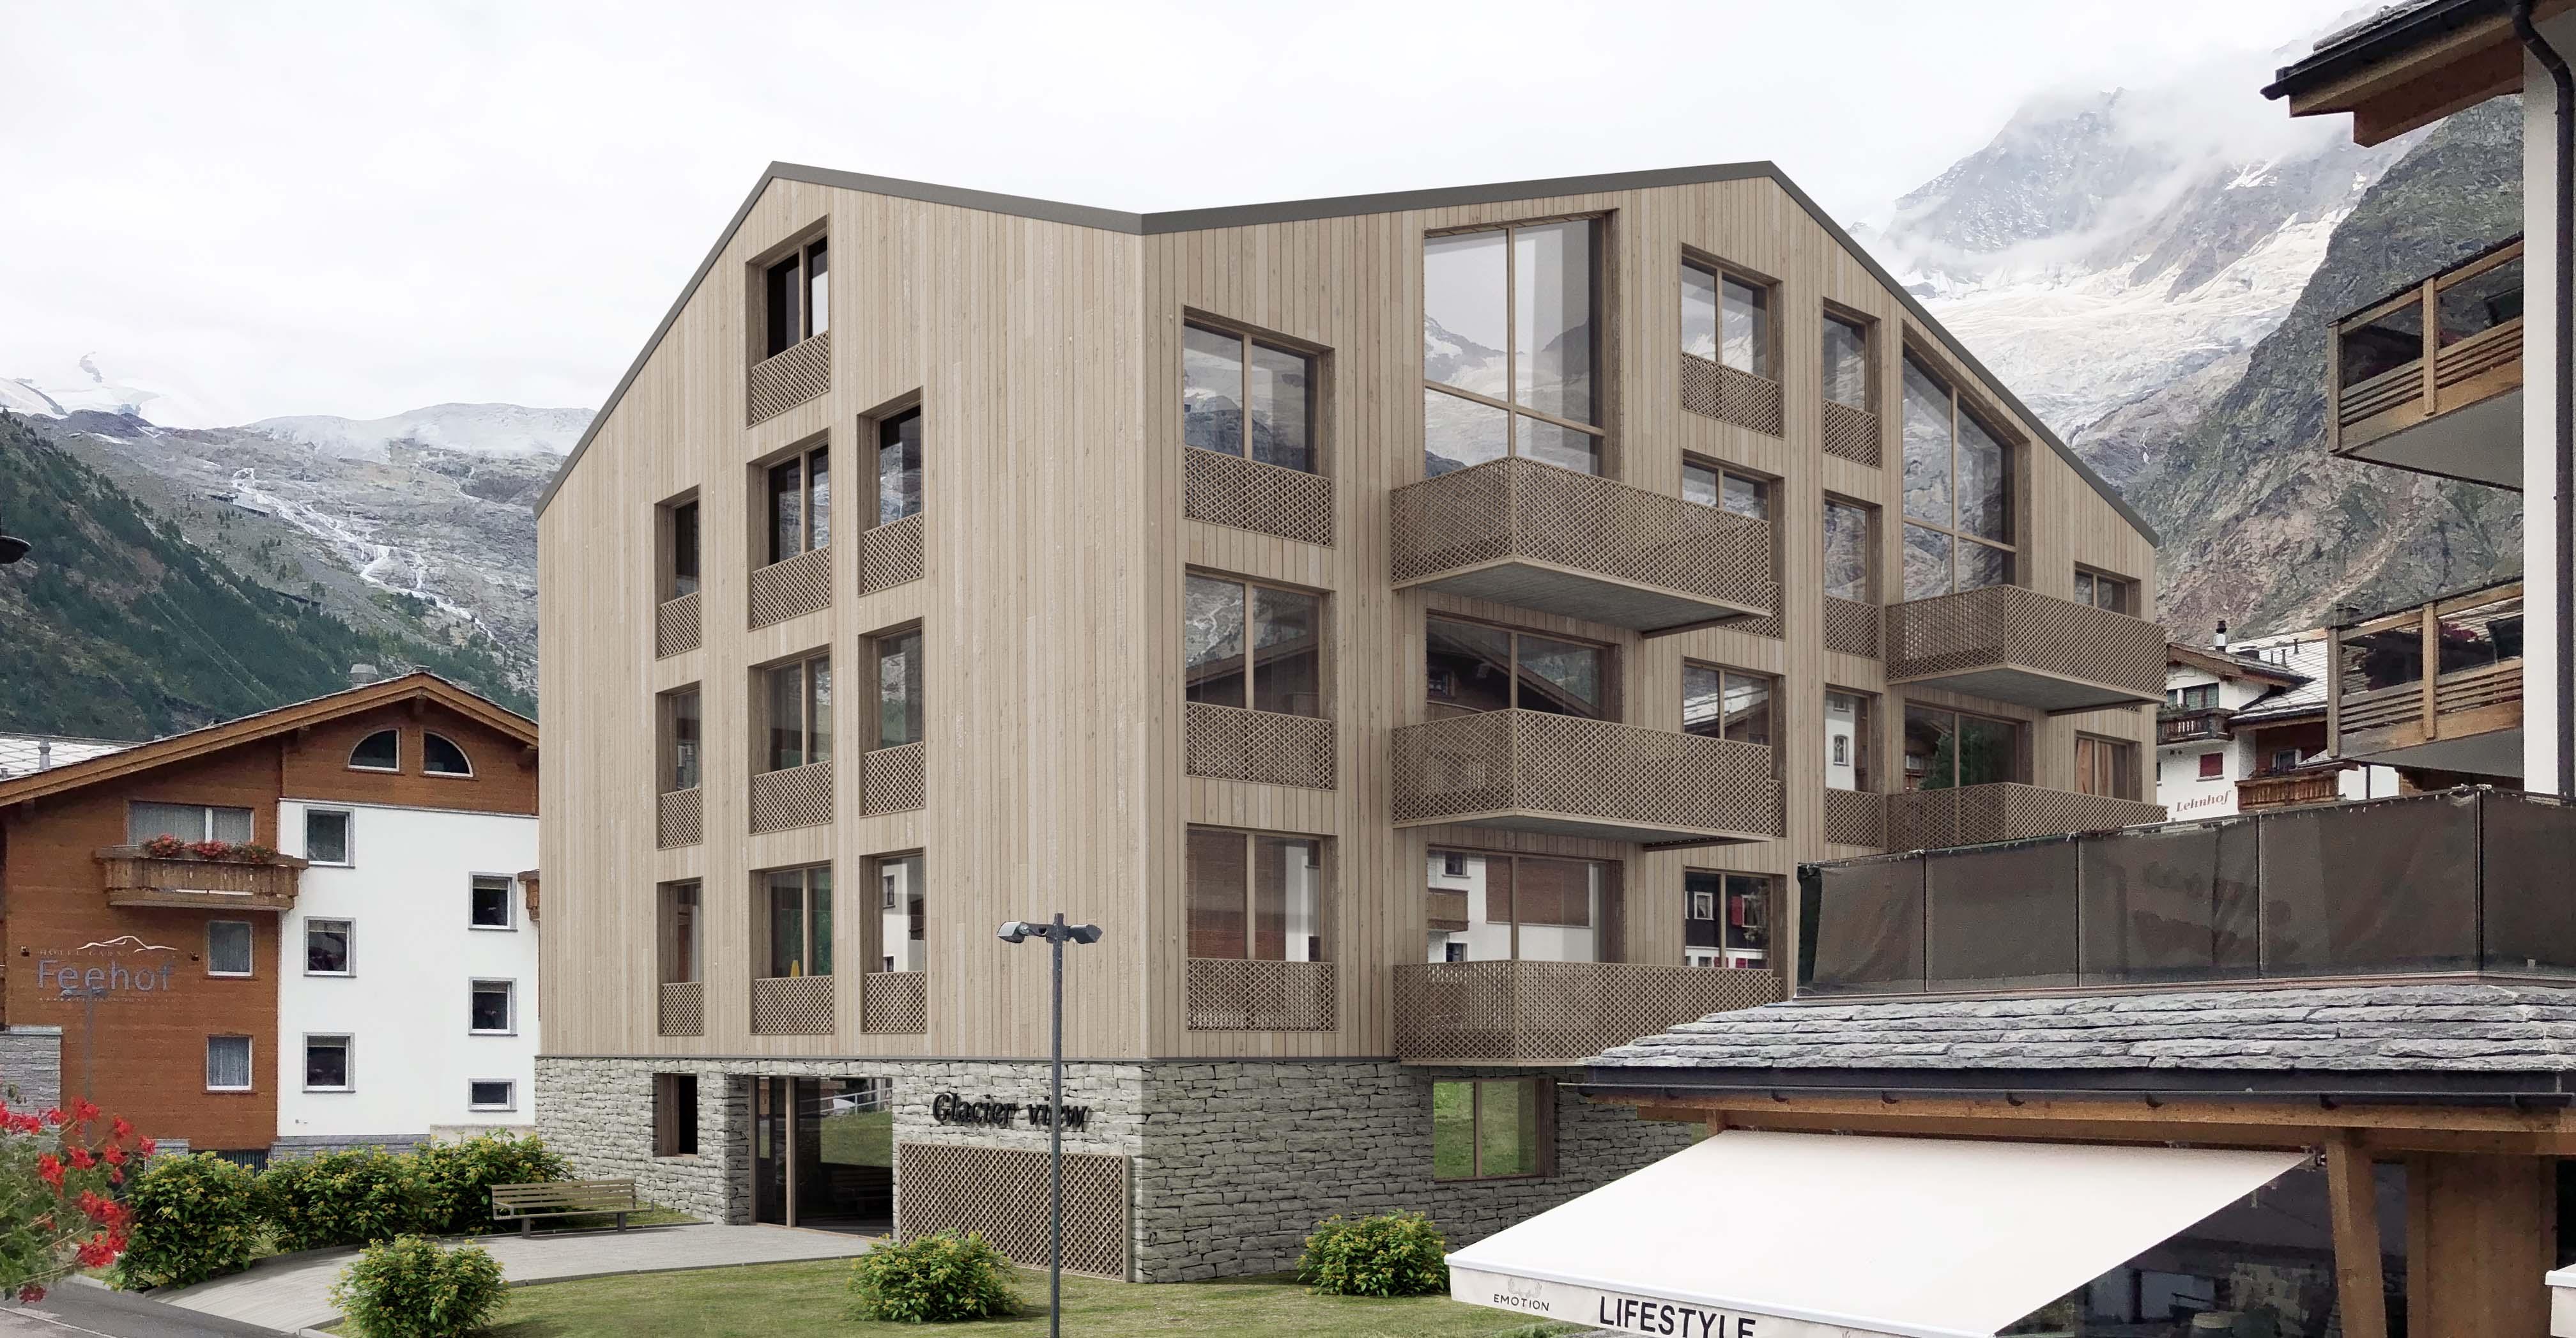 Saastal Village Apartments, Switzerland